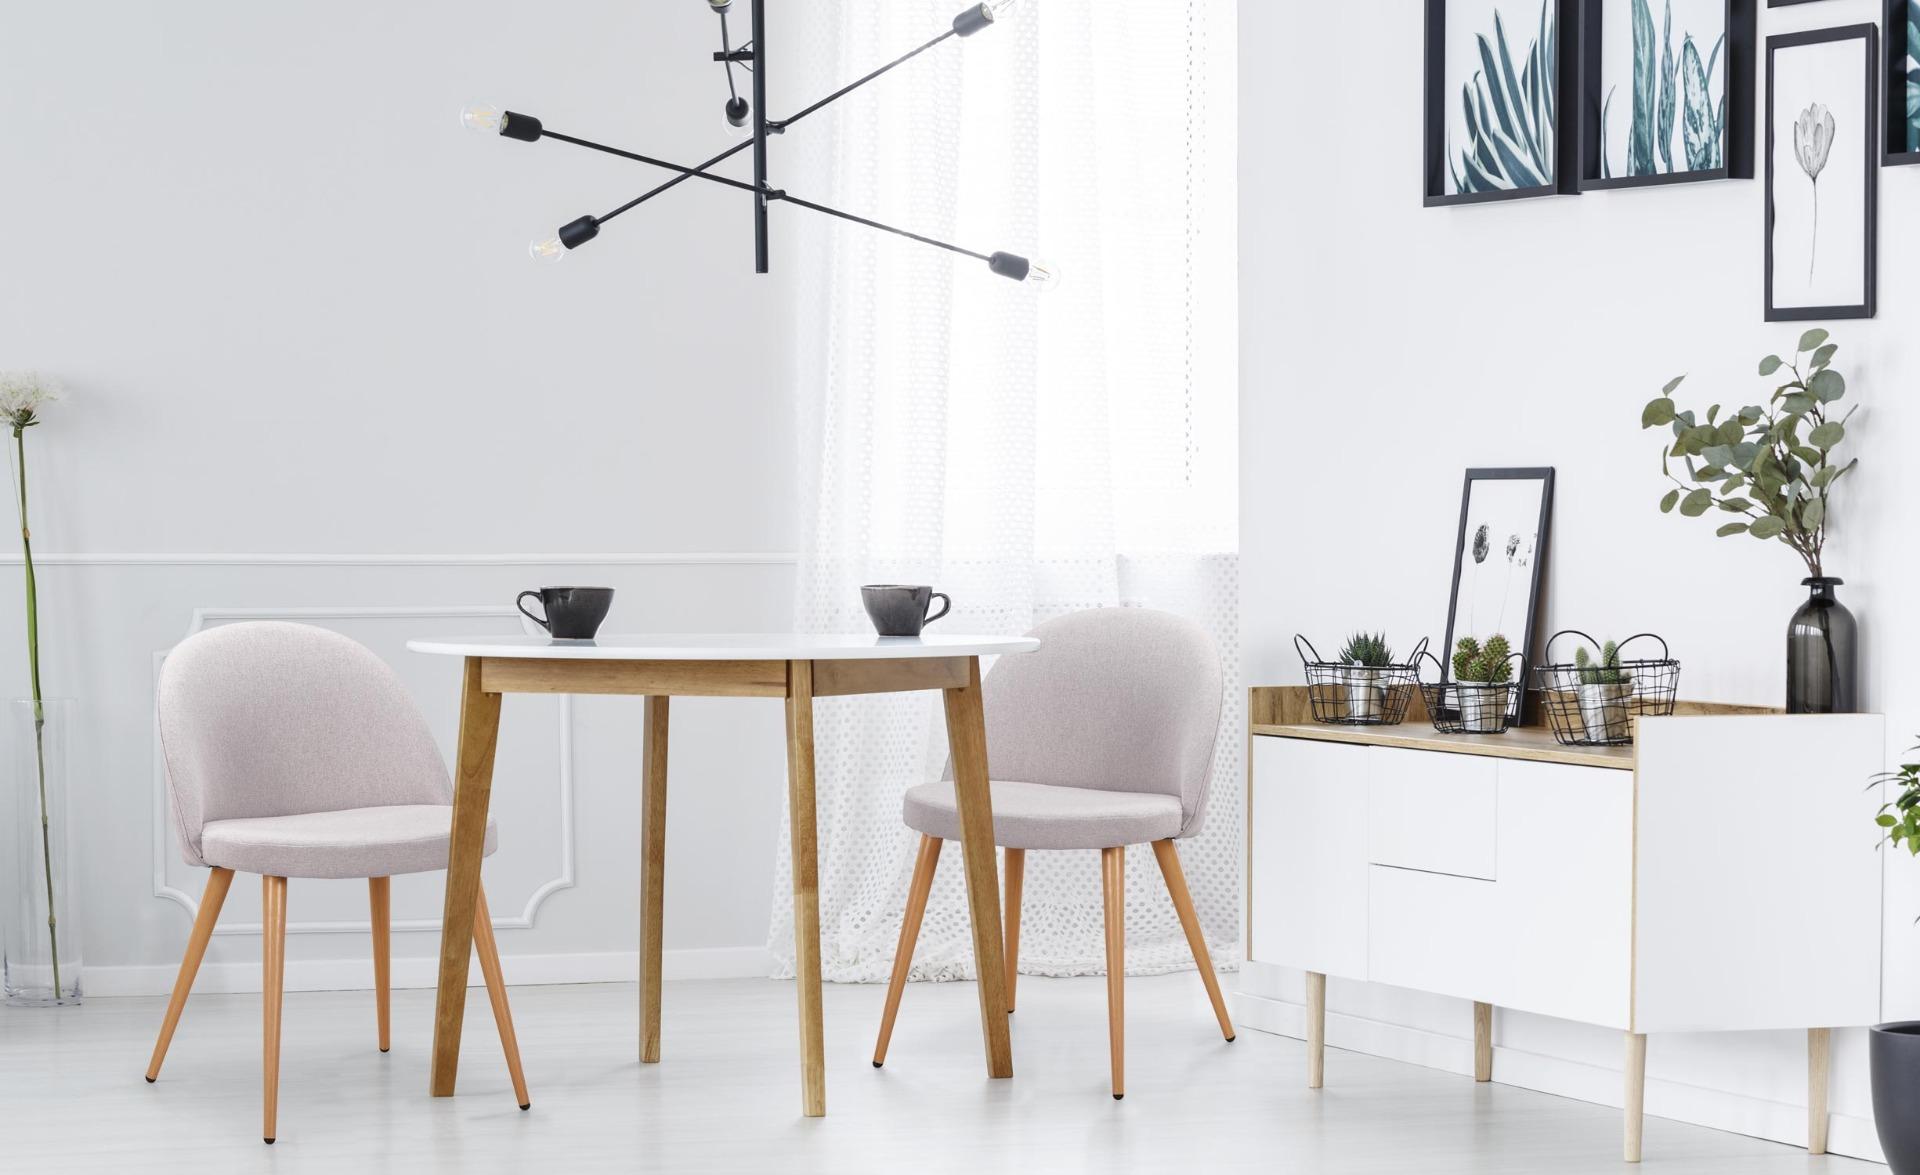 Maury Set mit 2 Stühlen, Stoffbezug Hellgrau